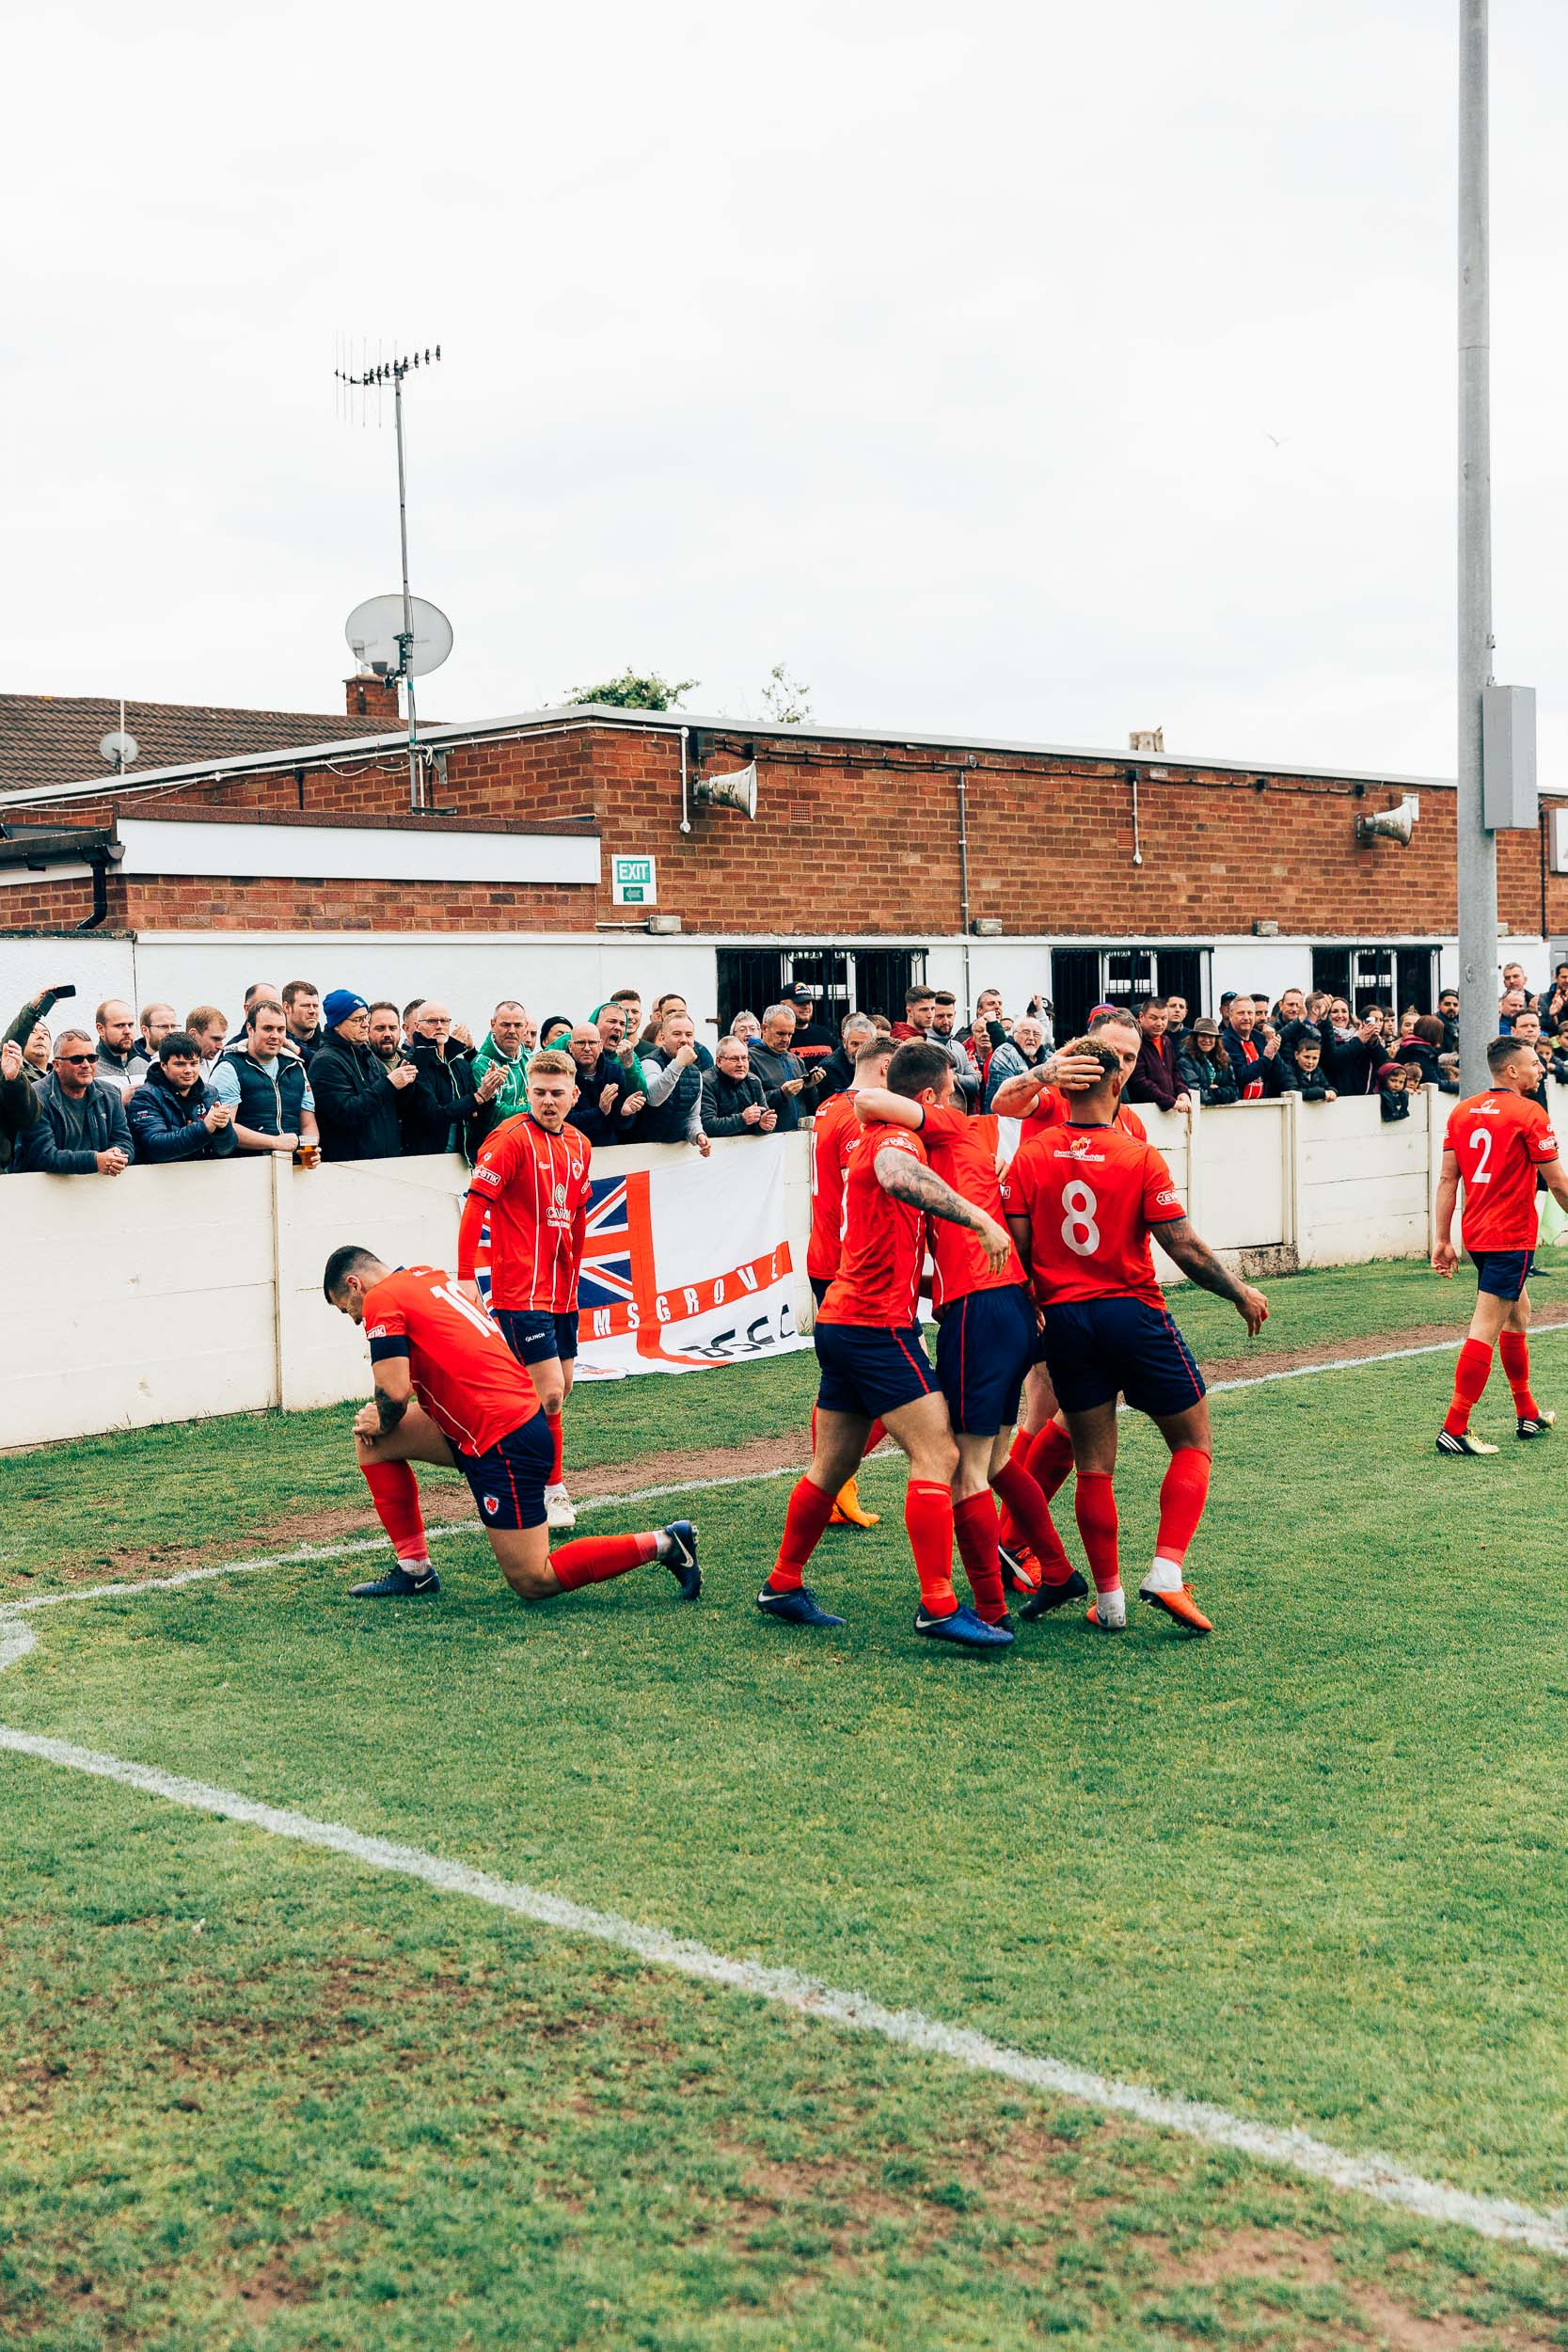 06_05_2019_Bromsgrove_Sporting_Corby-109.jpg